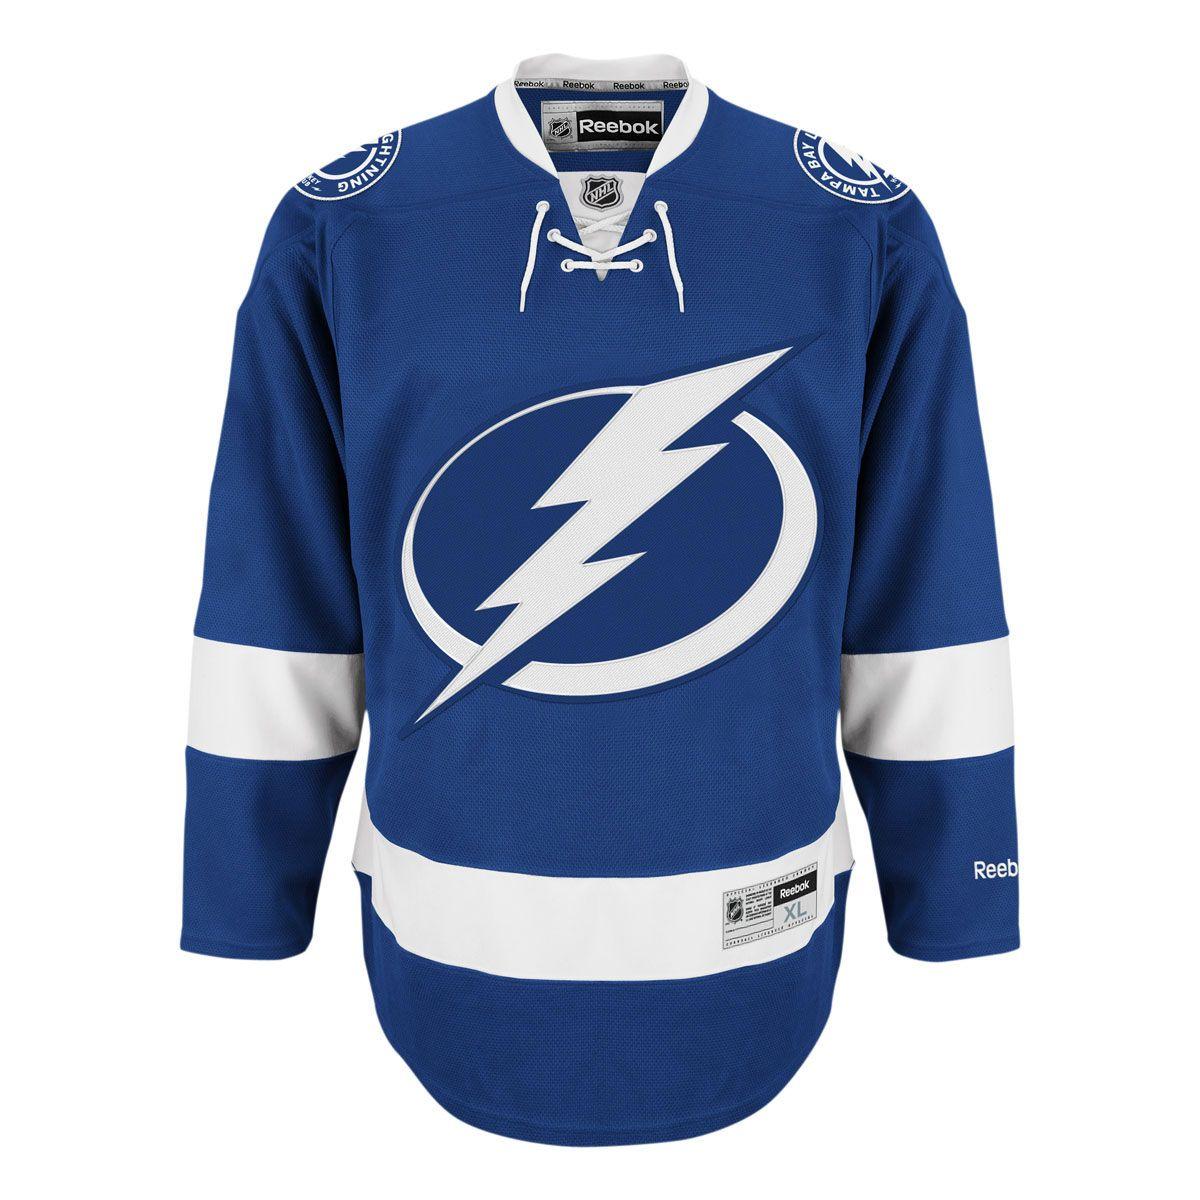 6069bd425 ... discount tampa bay lightning reebok premier replica home nhl hockey  jersey icejerseys official fan shop 124.50